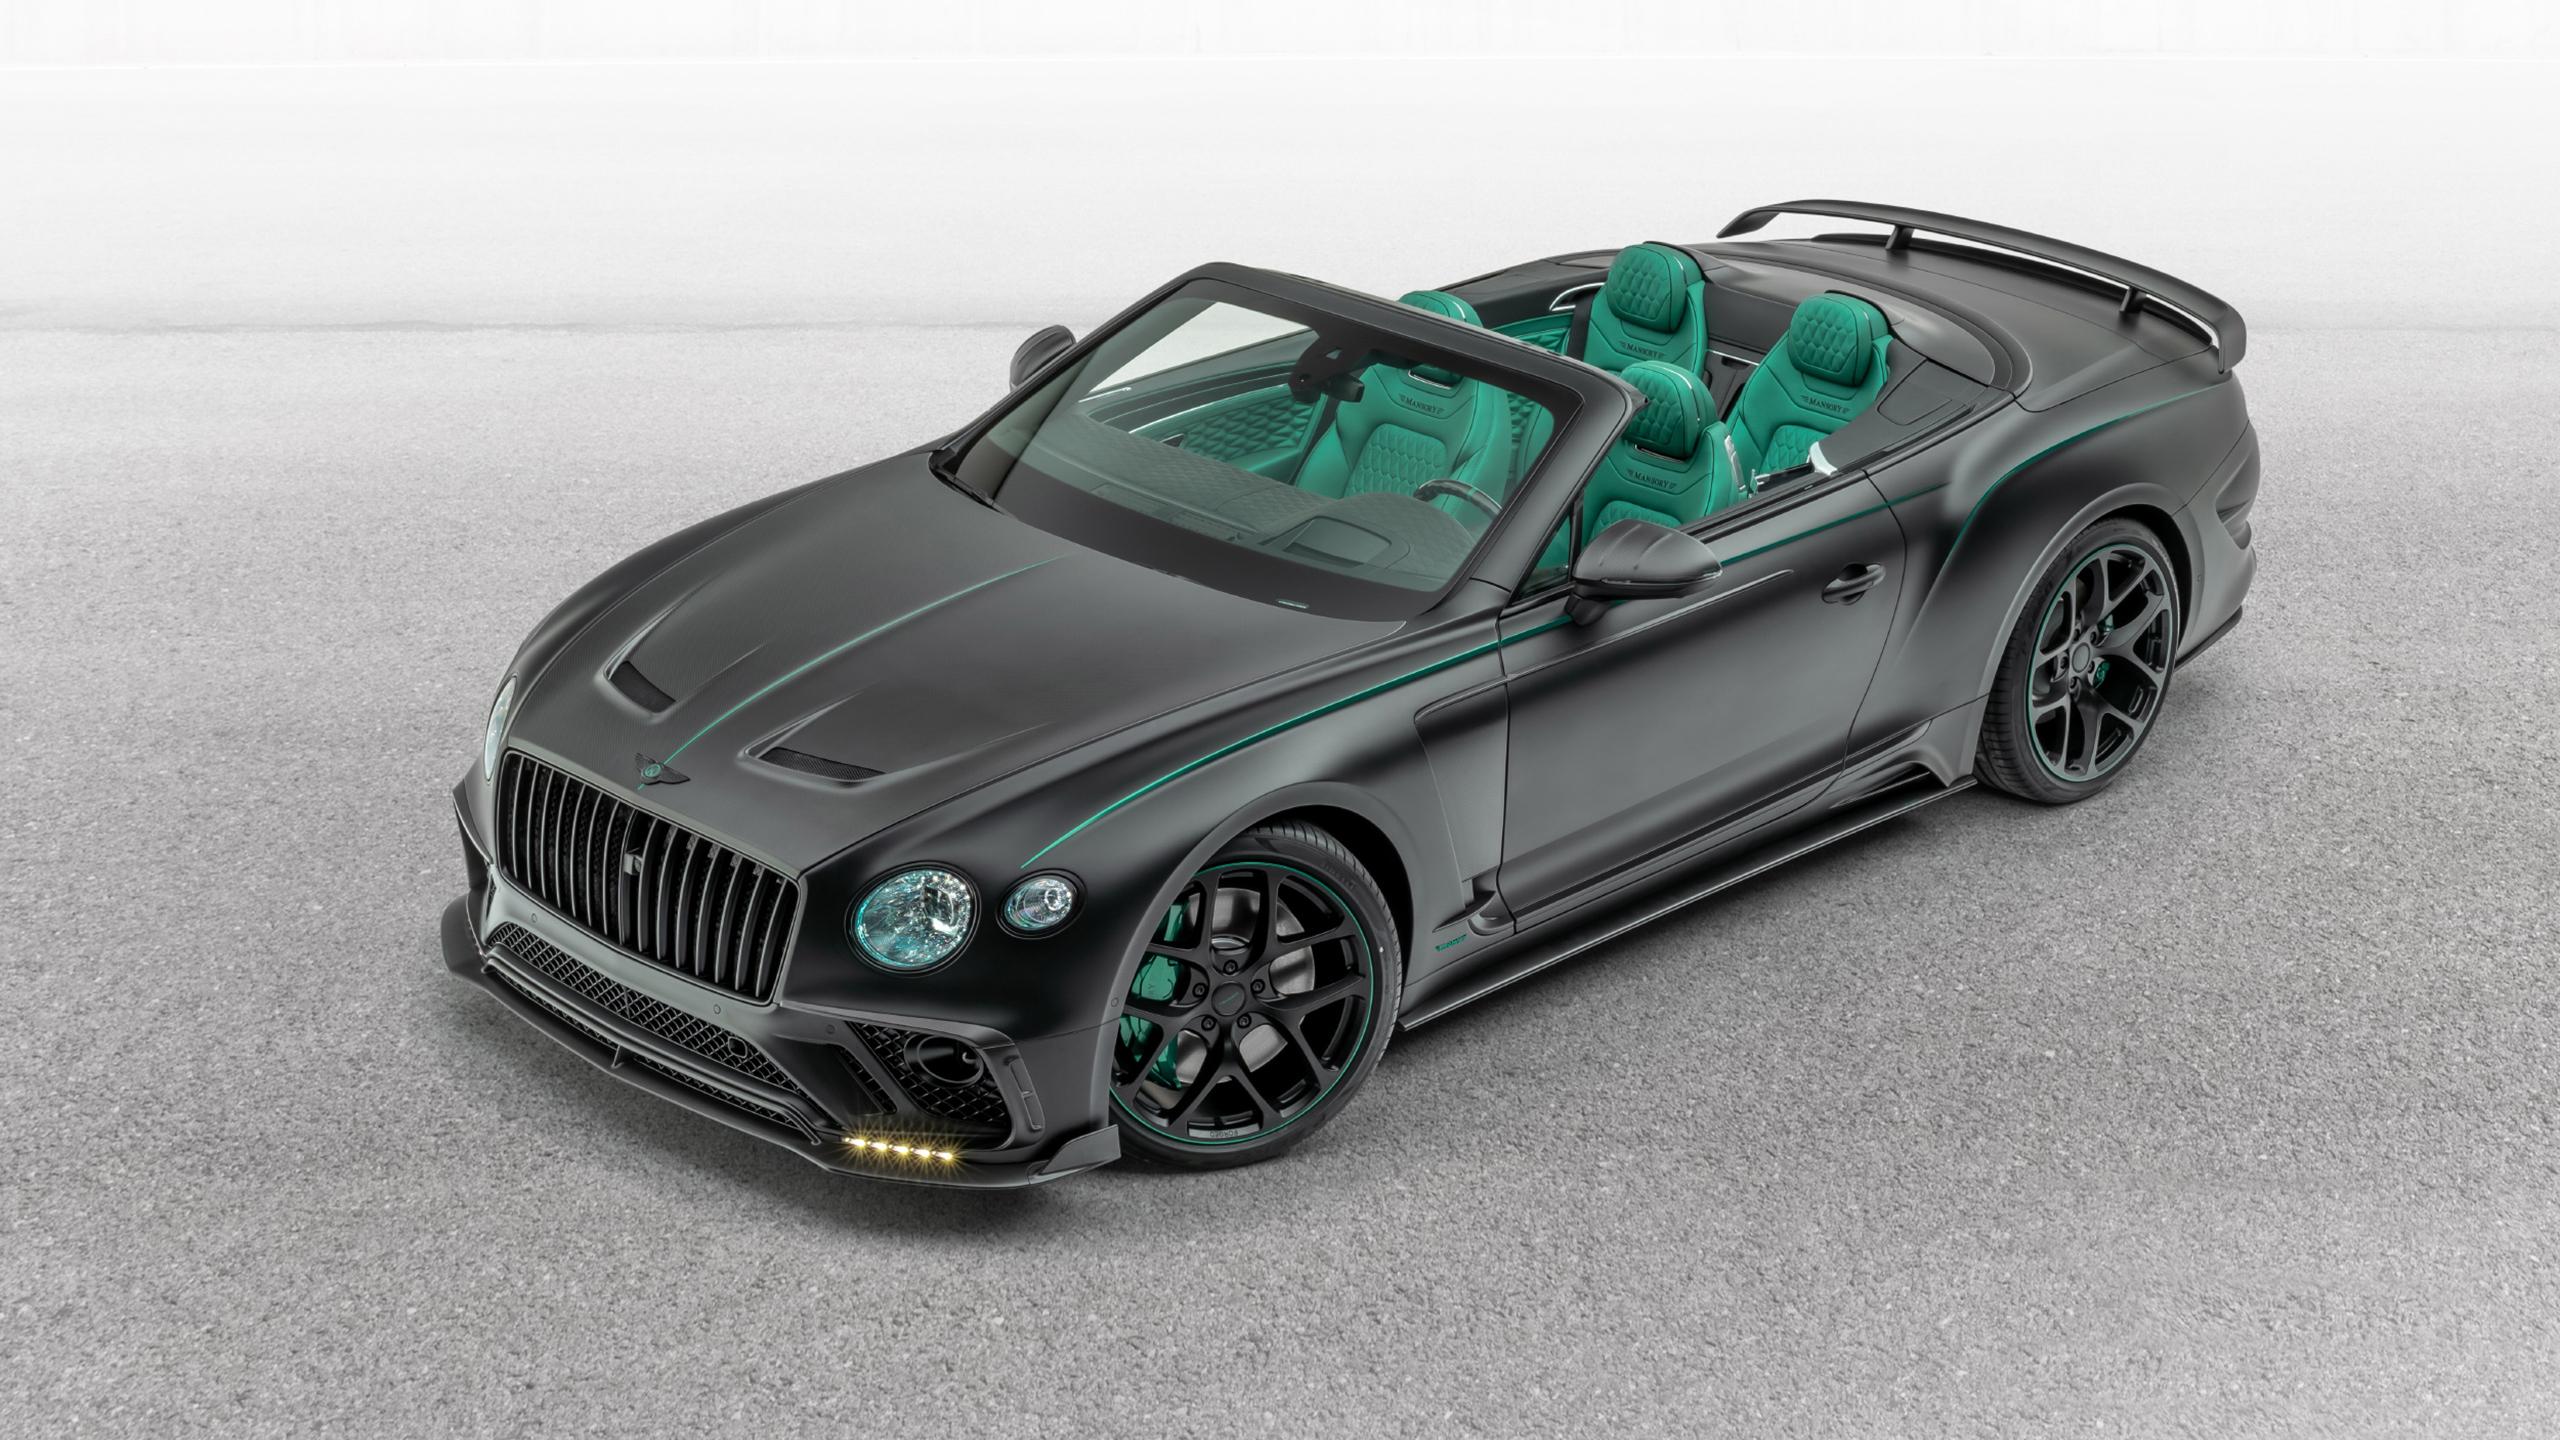 Mansory Bentley Continental Gt V8 Convertible 2020 3 Wallpaper Hd Car Wallpapers Id 14522